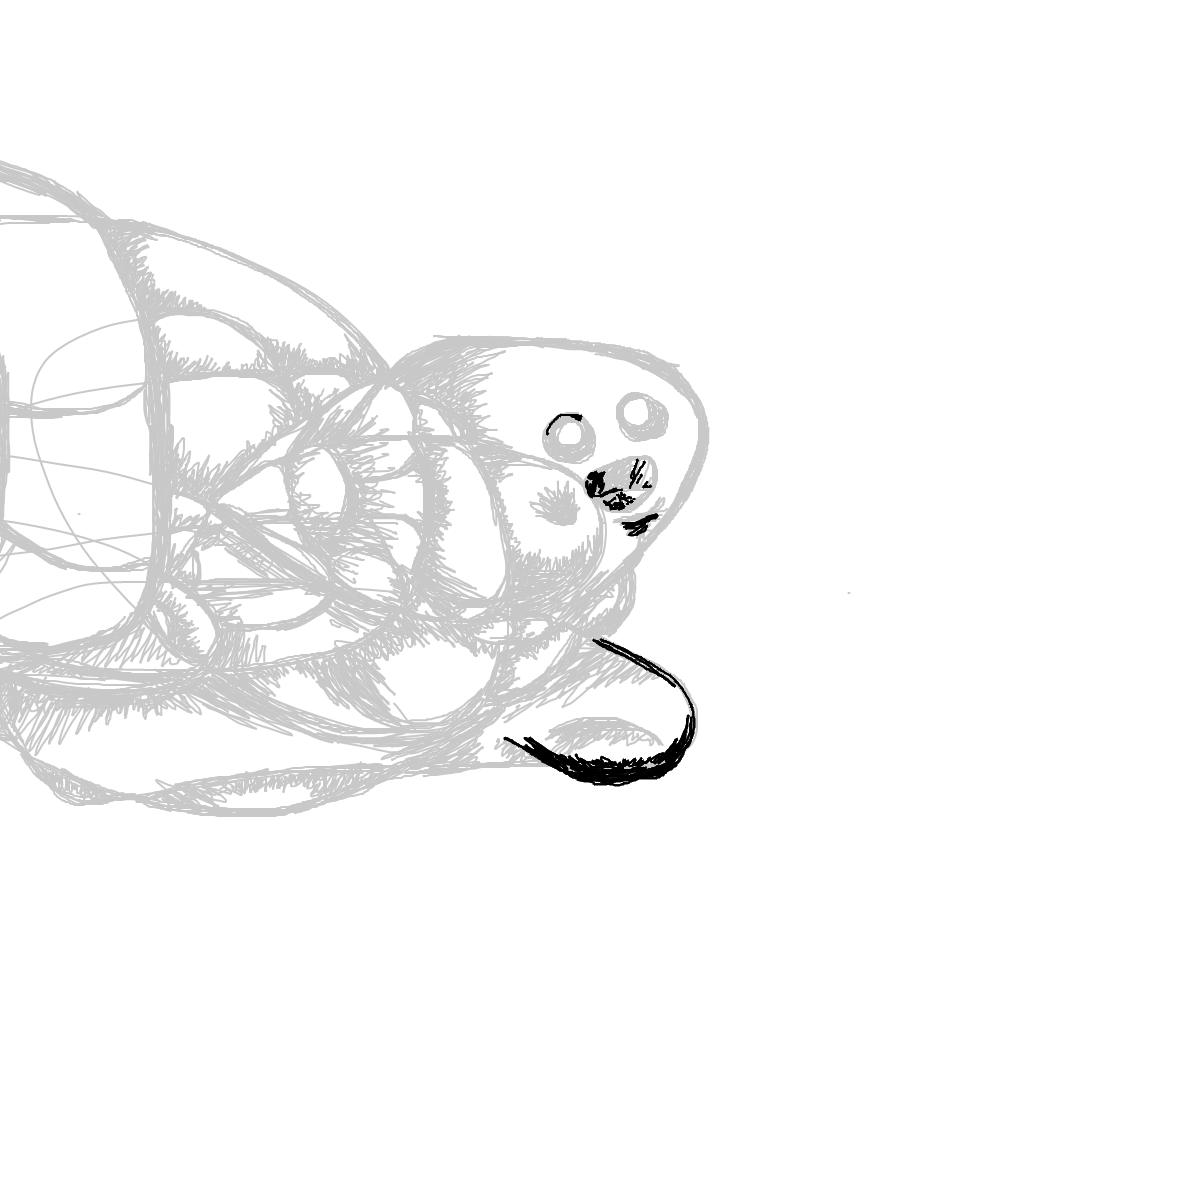 BAAAM drawing#7308 lat:42.8566665649414060lng: -2.7166678905487060